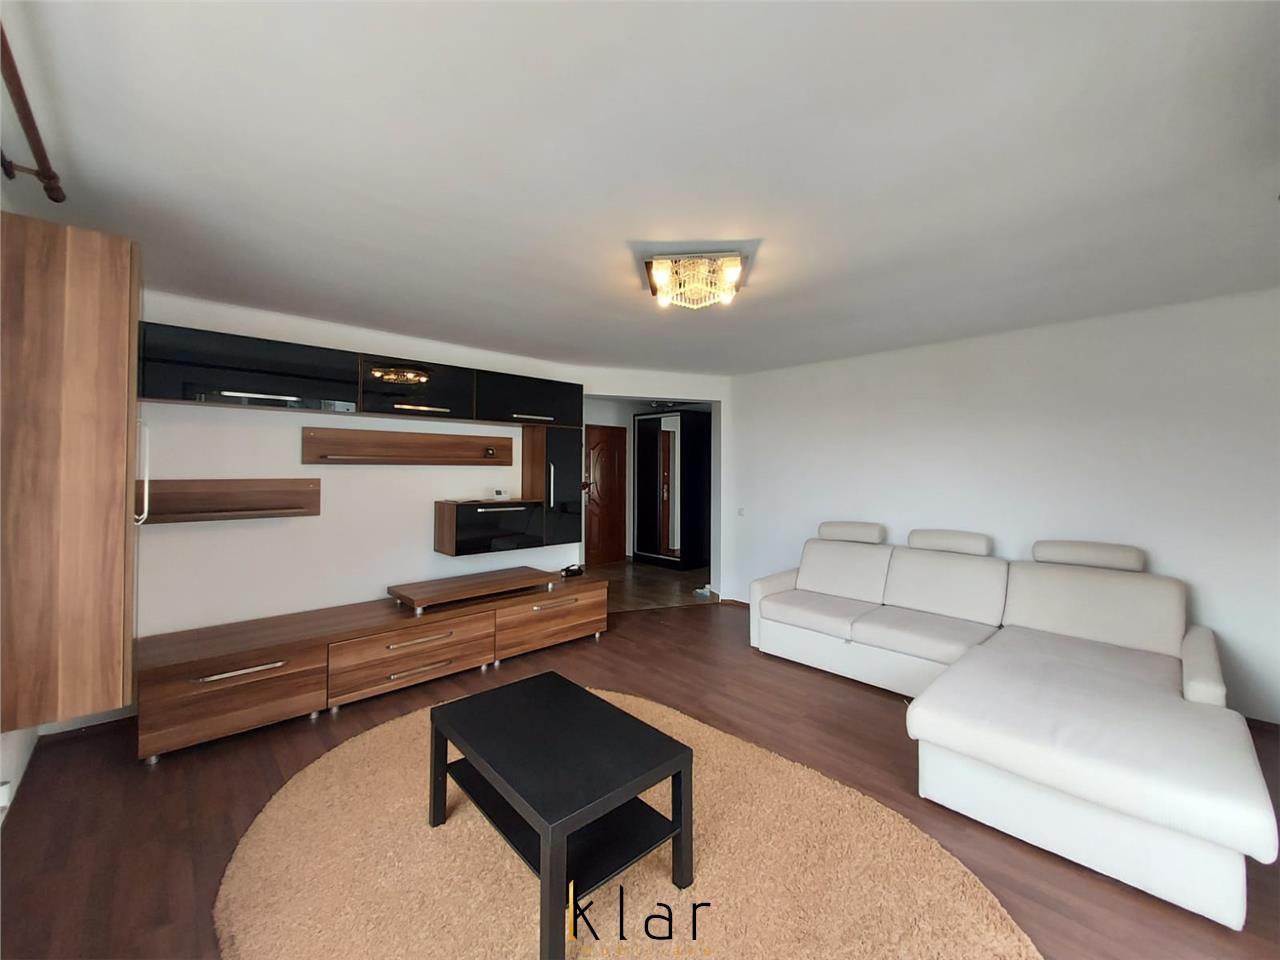 Apartament 2 camere DECOMANDATE, ansamblu privat zona Terra!